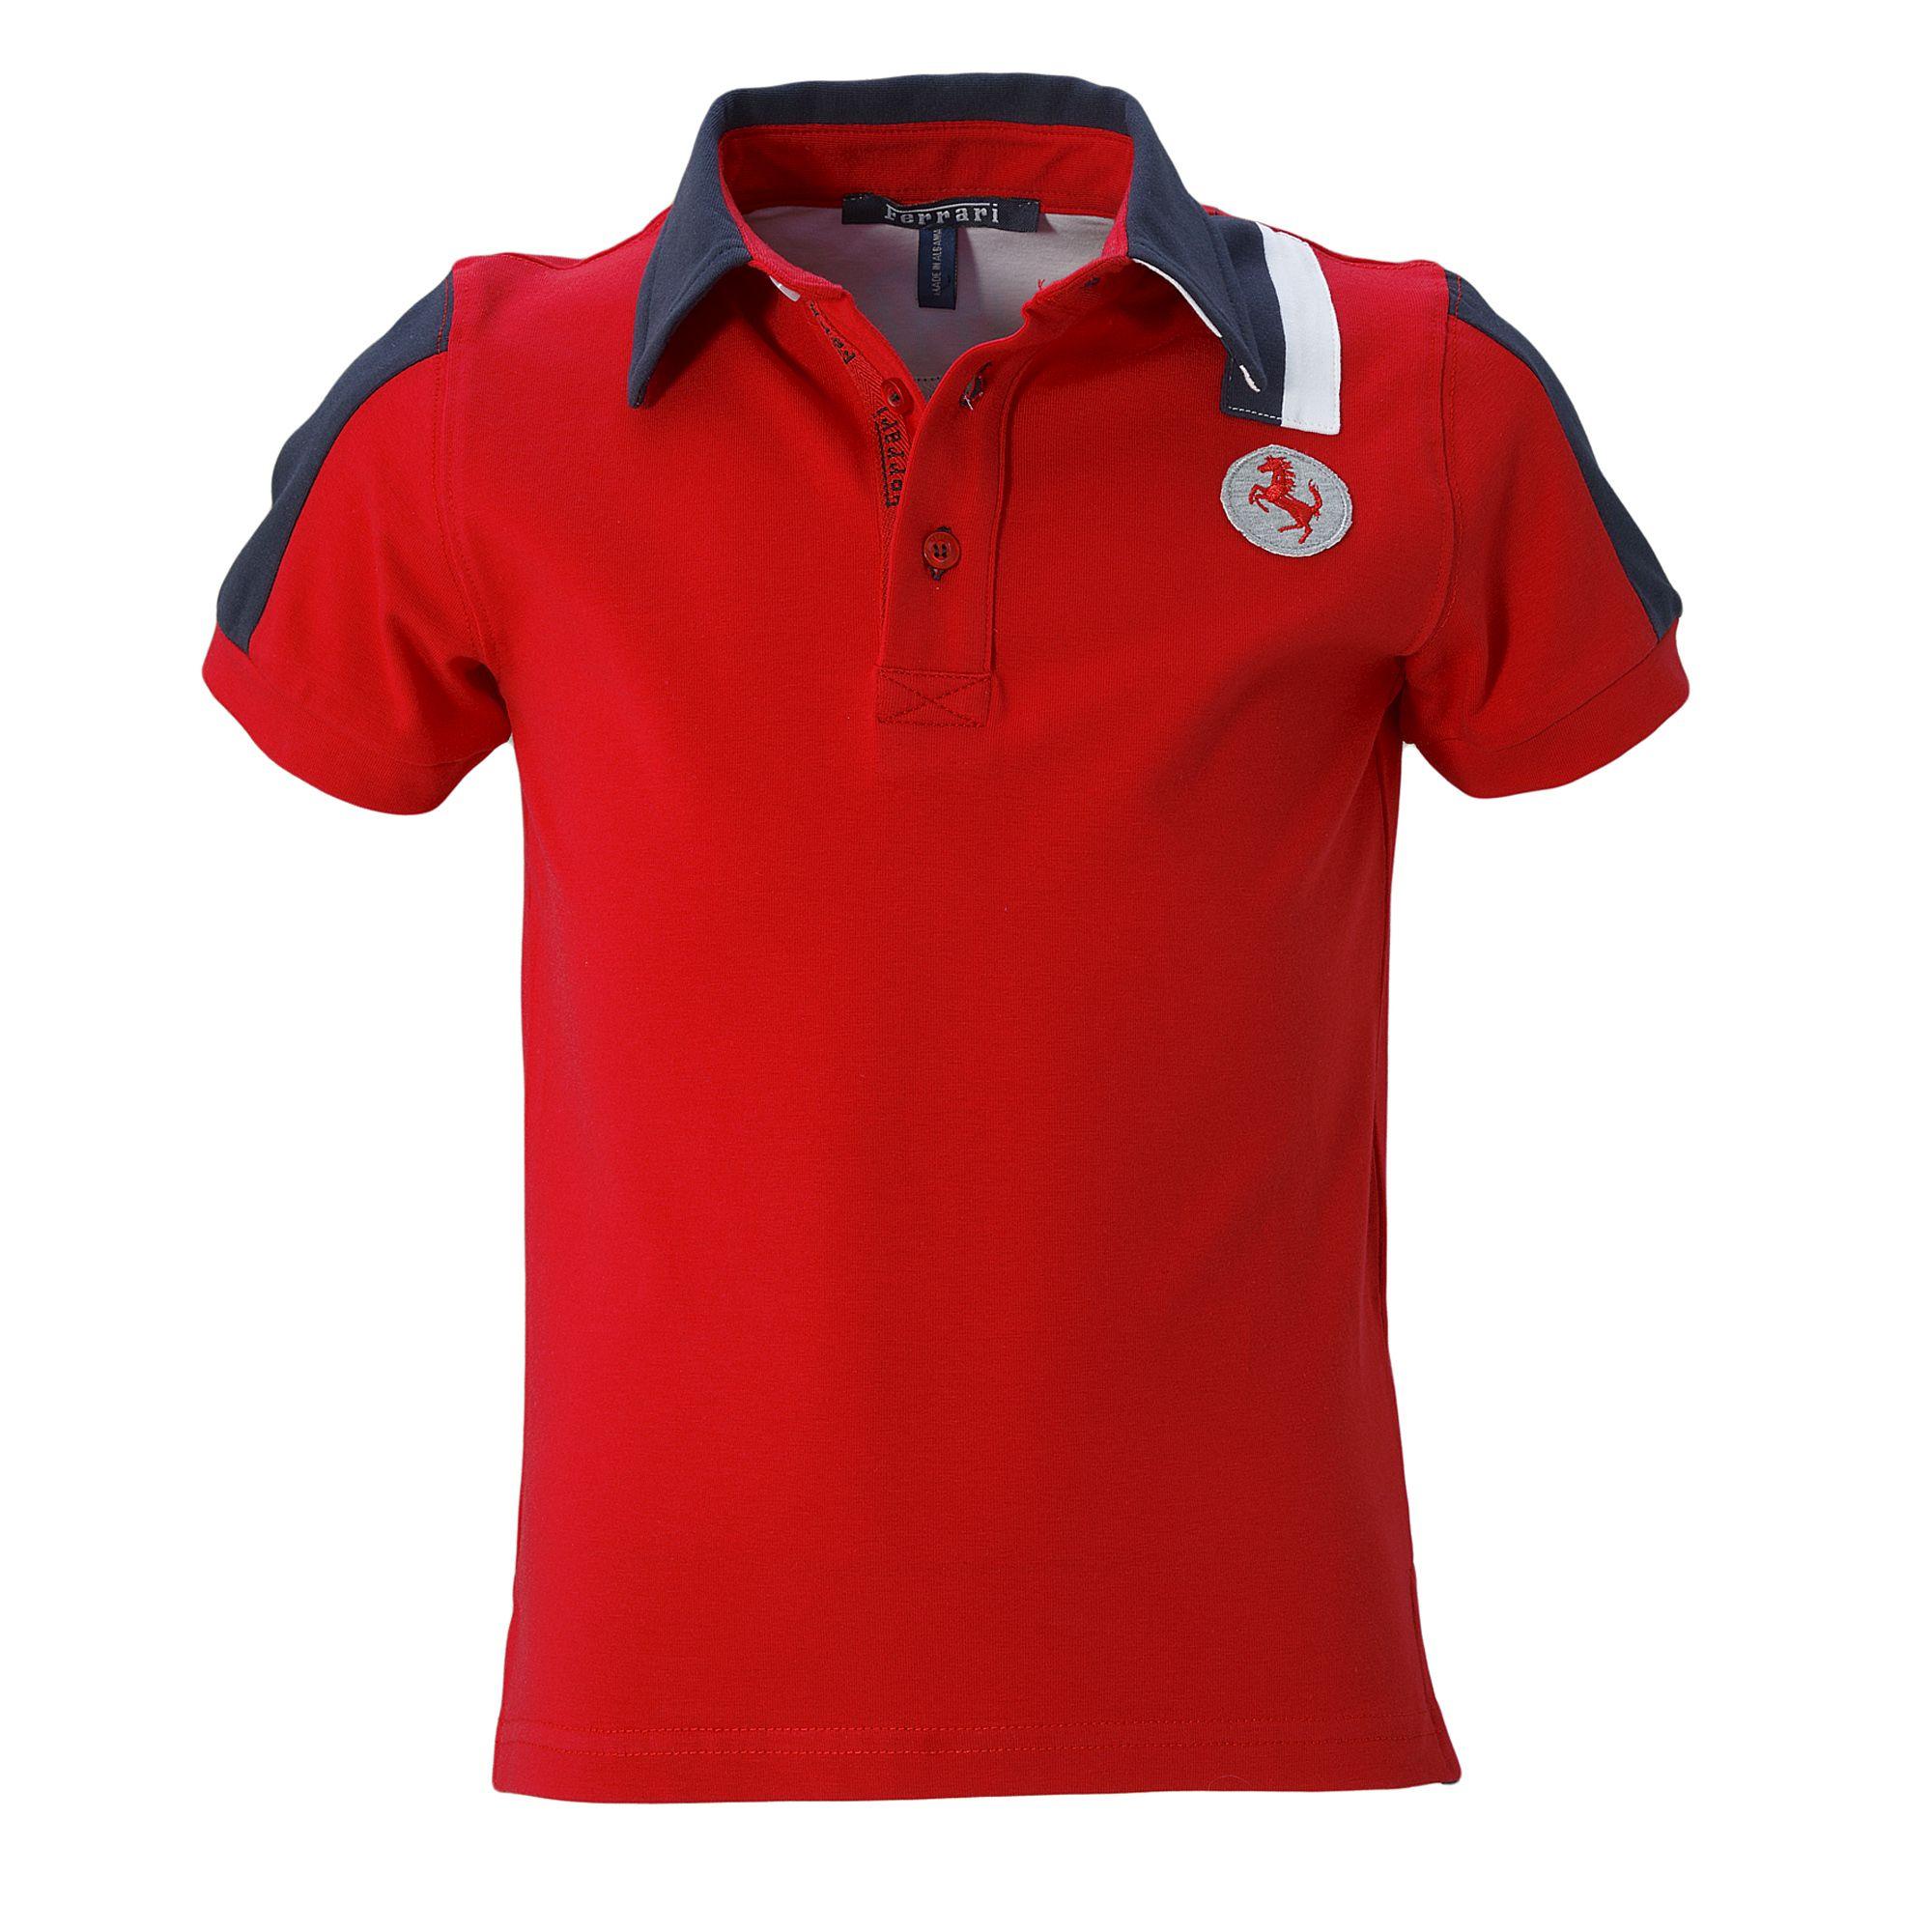 products logo t shirt shirts navy benz dsc mercedes supreme